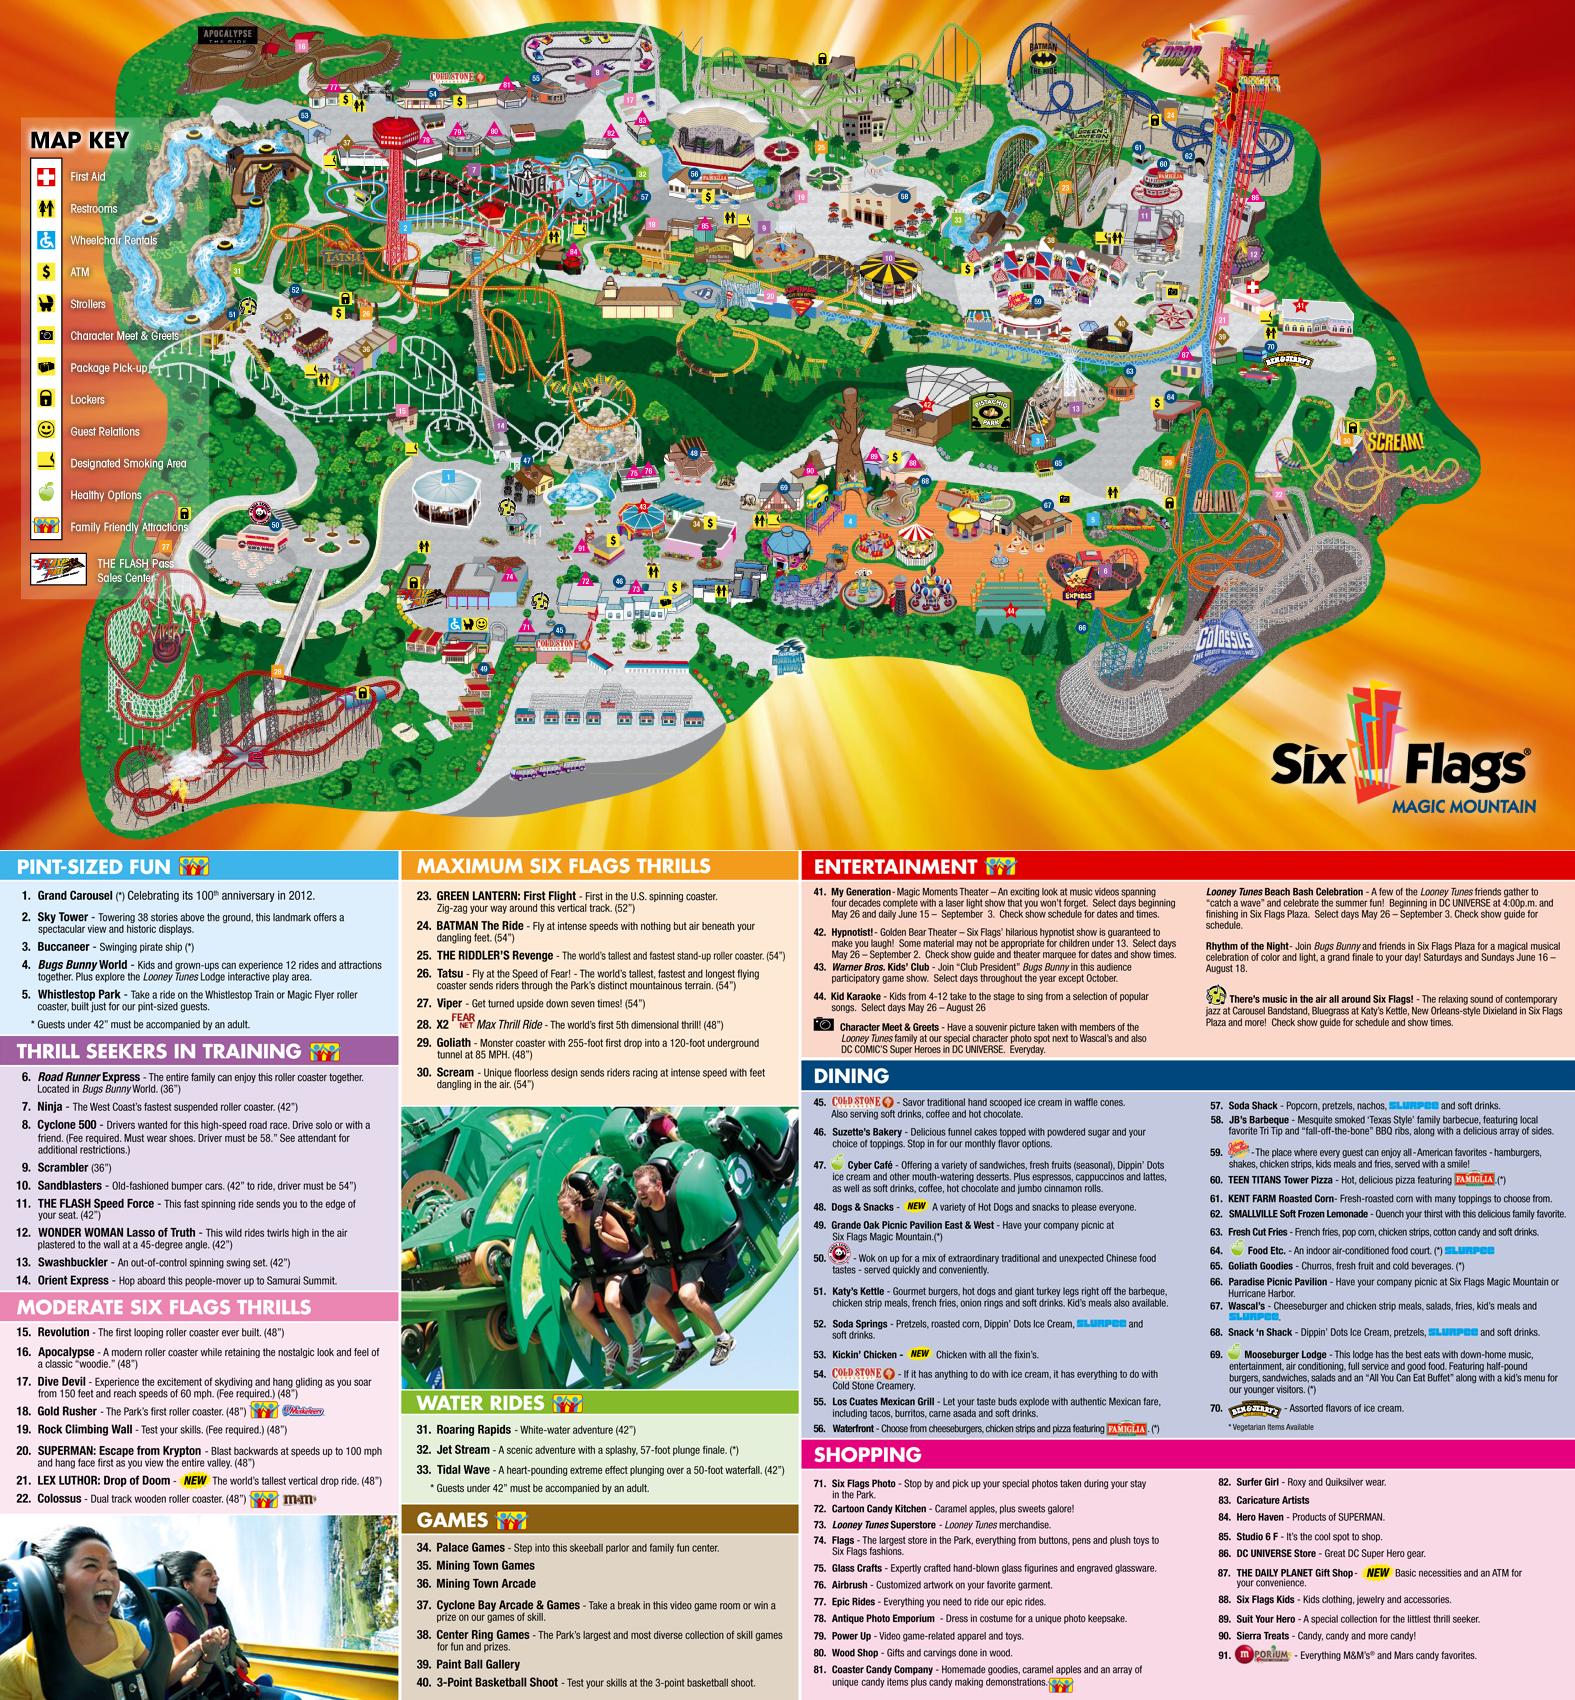 Six Flags Magic Mountain Roller Coaster Wiki Fandom